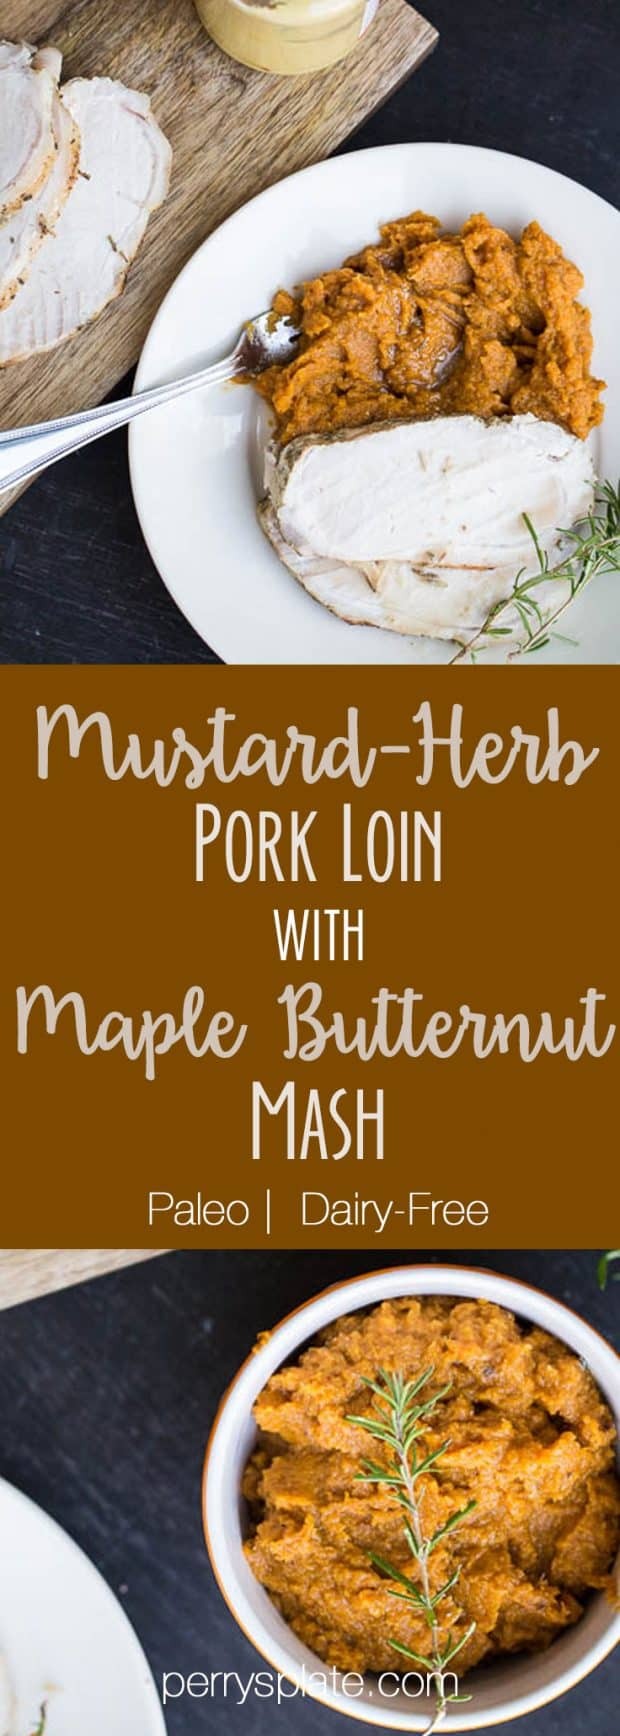 Mustard-Herb Pork Loin with Maple Butternut Mash | paleo recipes | pork recipes | butternut squash recipes | fall recipes | perrysplate.com